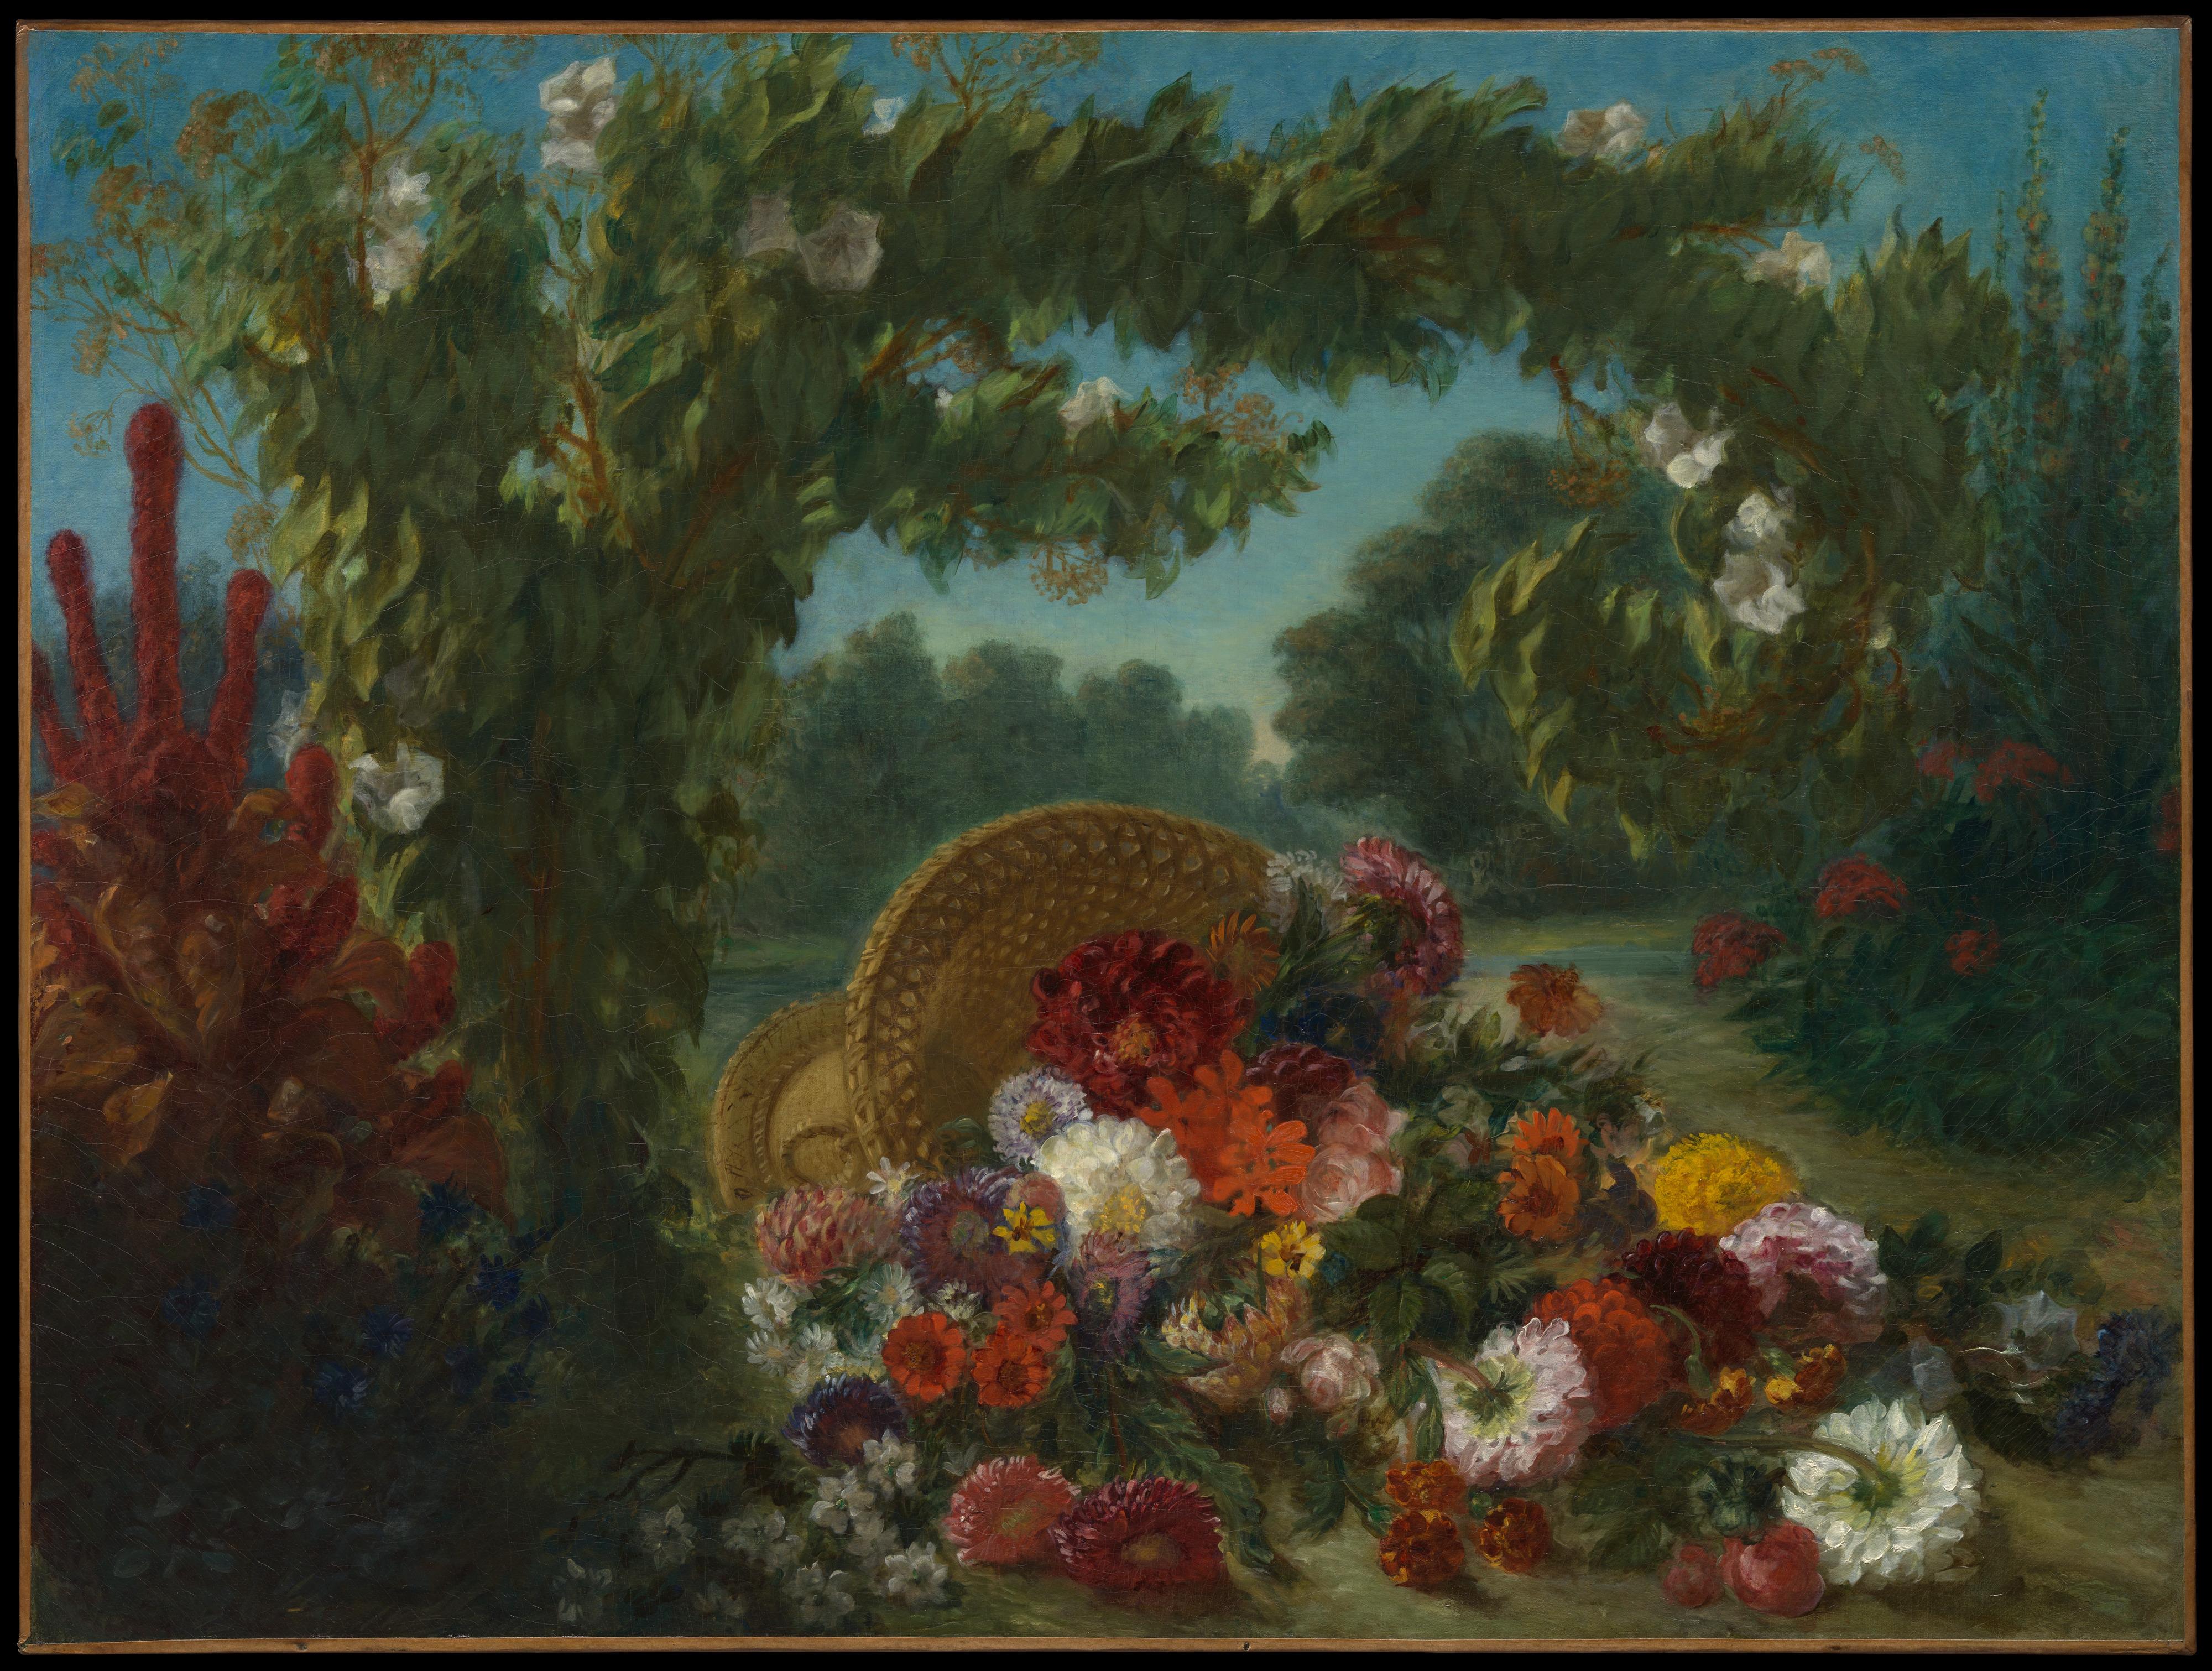 Eugène Delacroix | Basket of Flowers | The Met